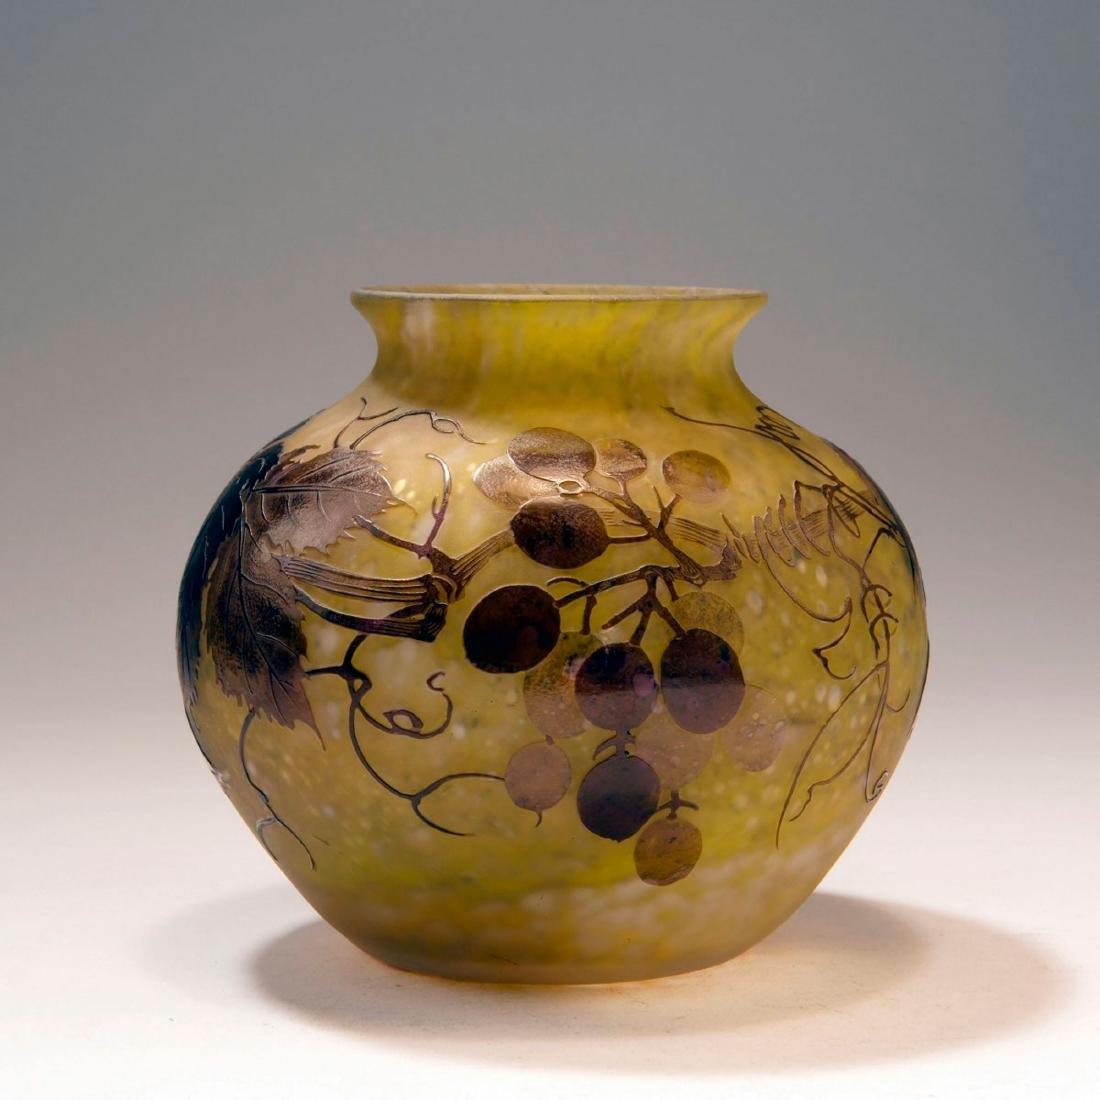 'Vigne' vase, 1920s